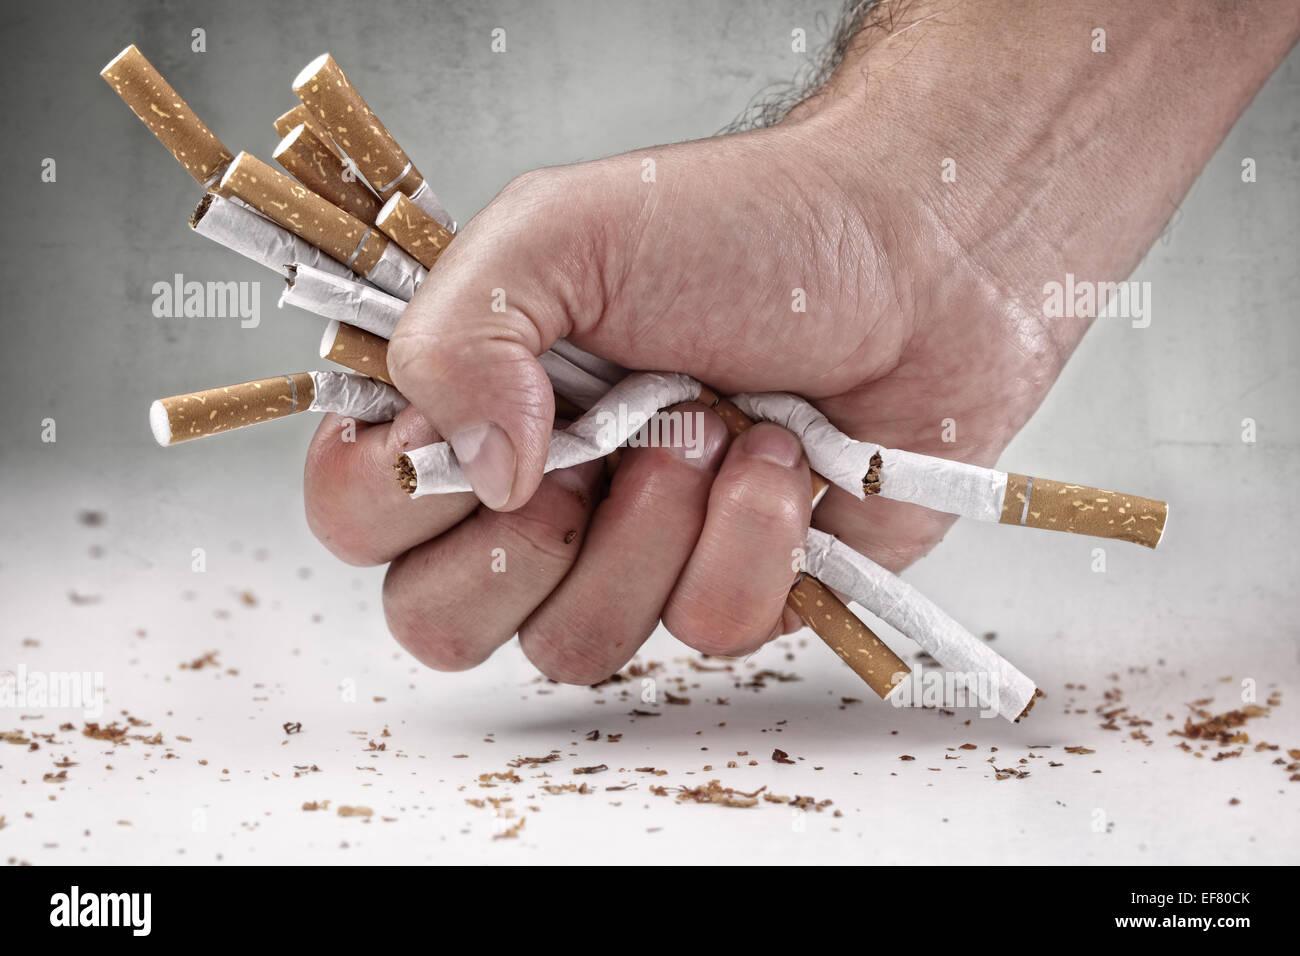 Arrêter de fumer Photo Stock